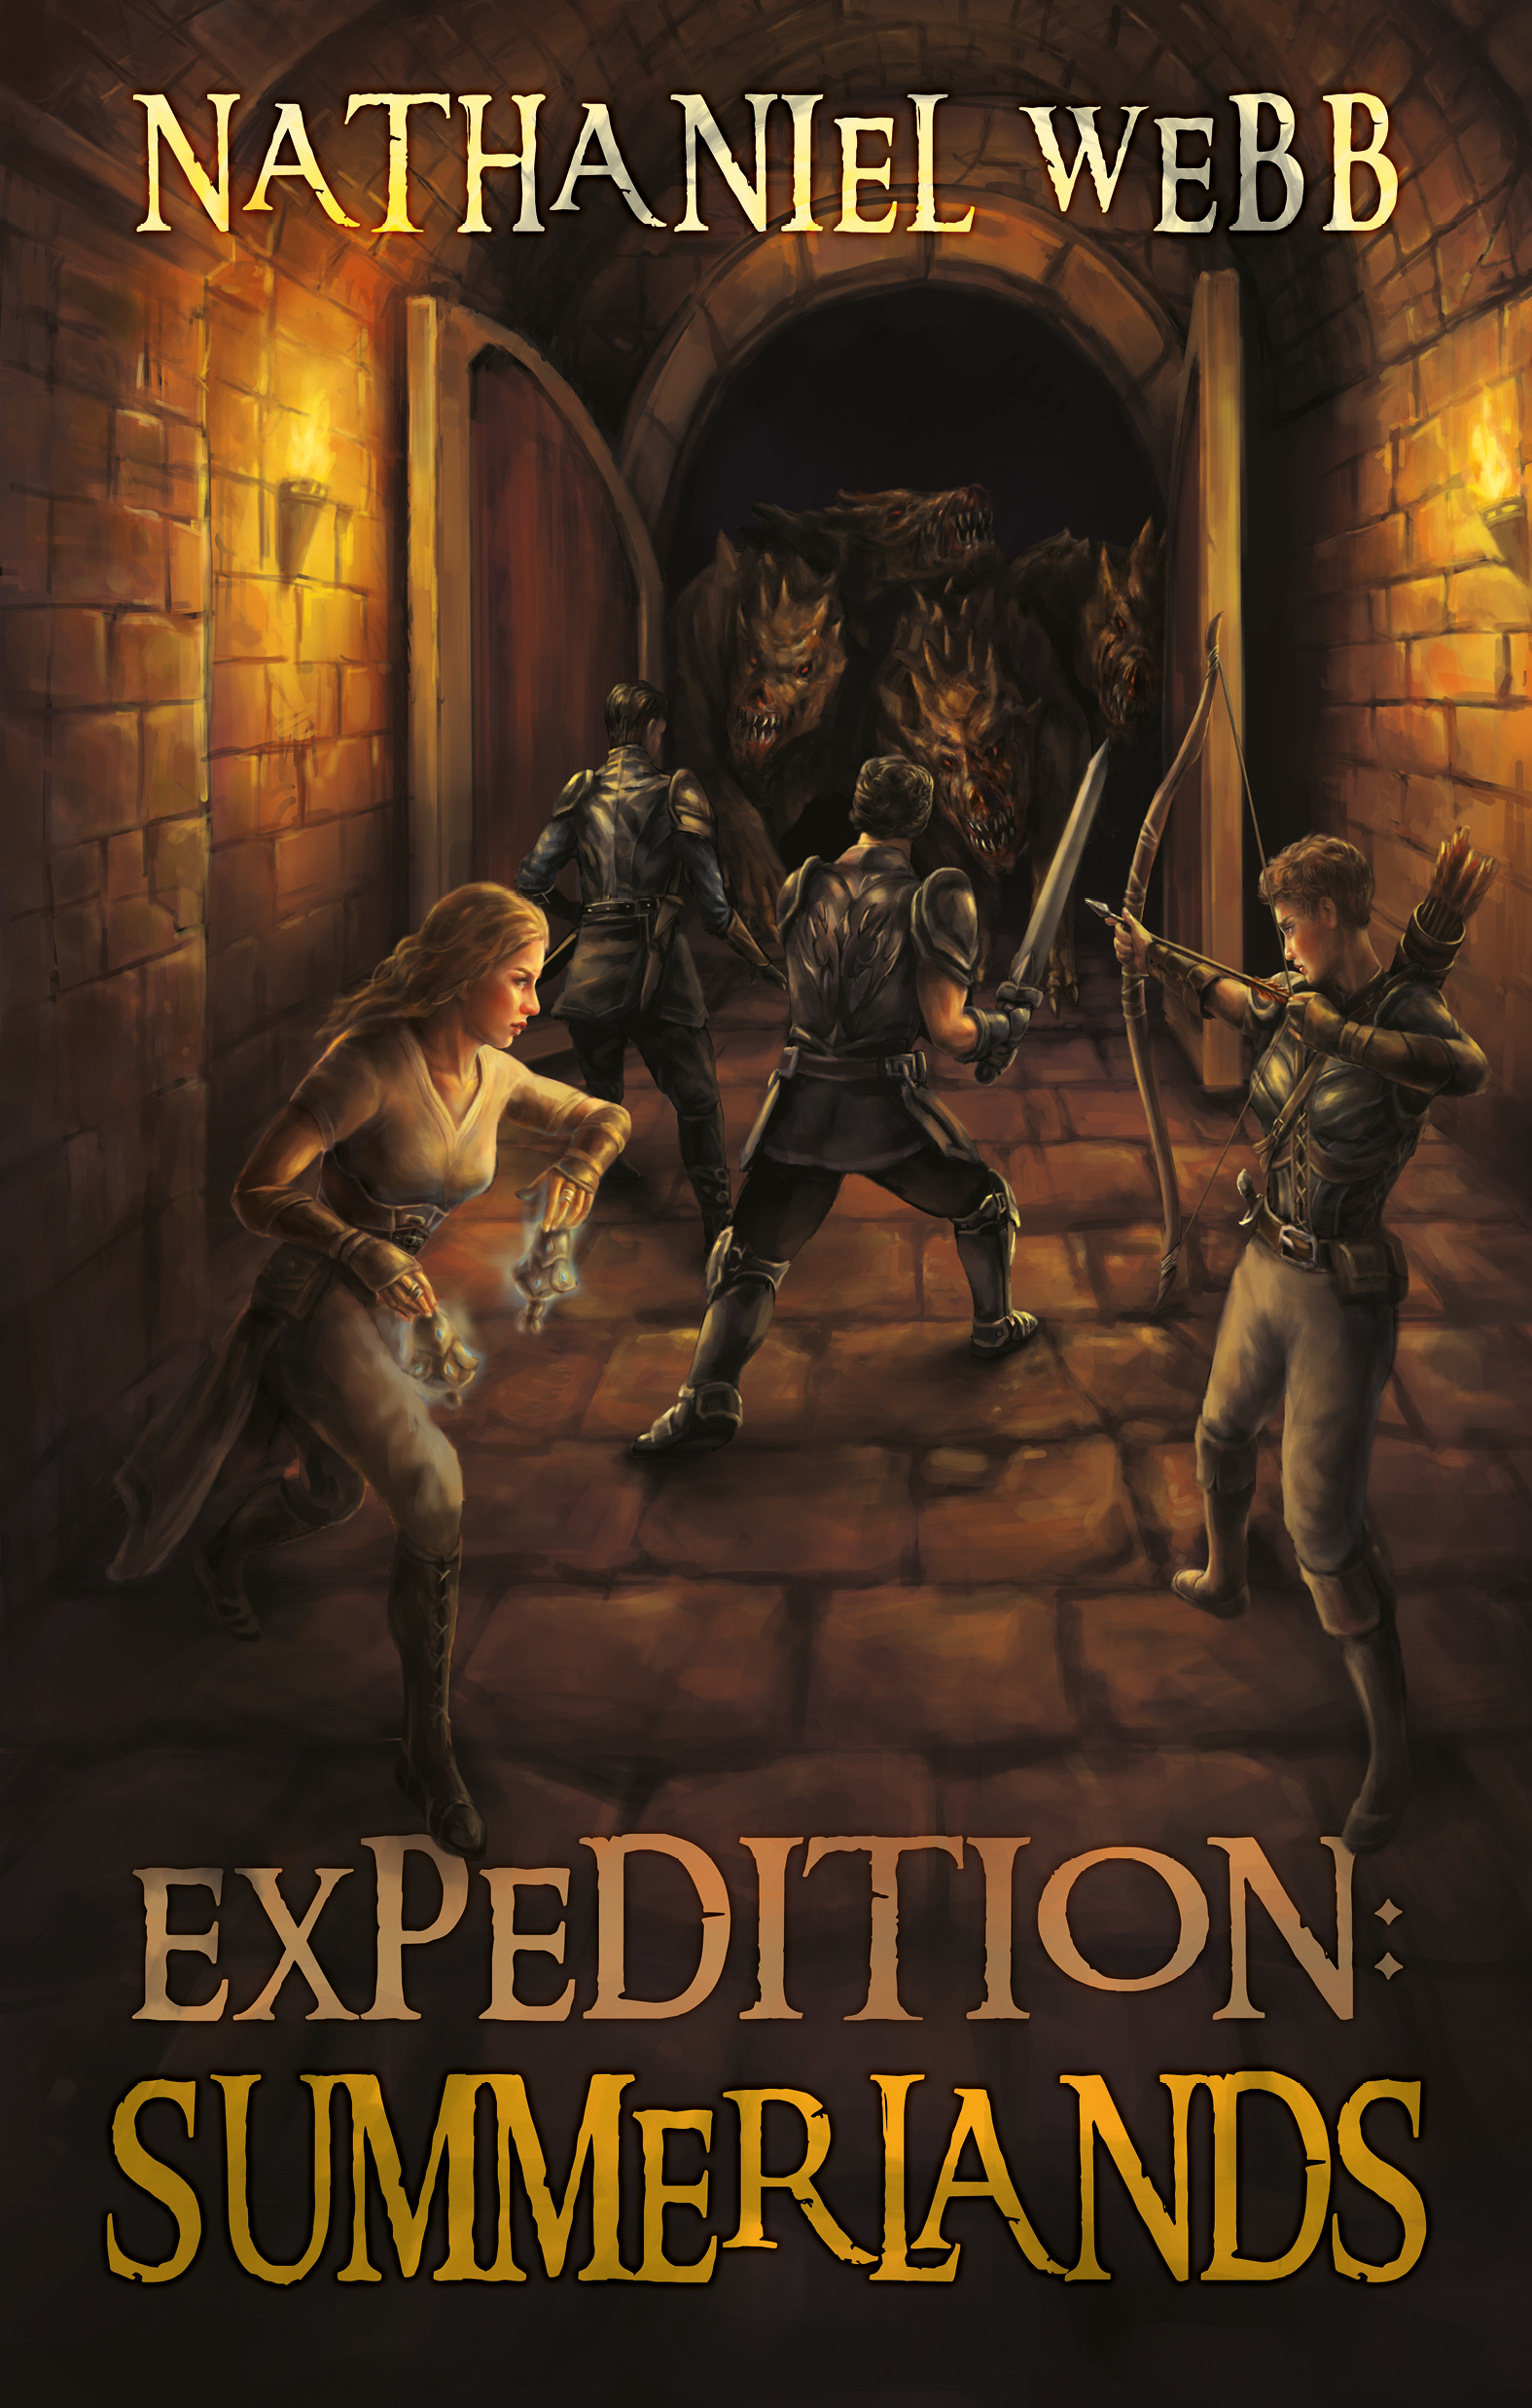 Expedition - Summerlands - Ebook.jpg